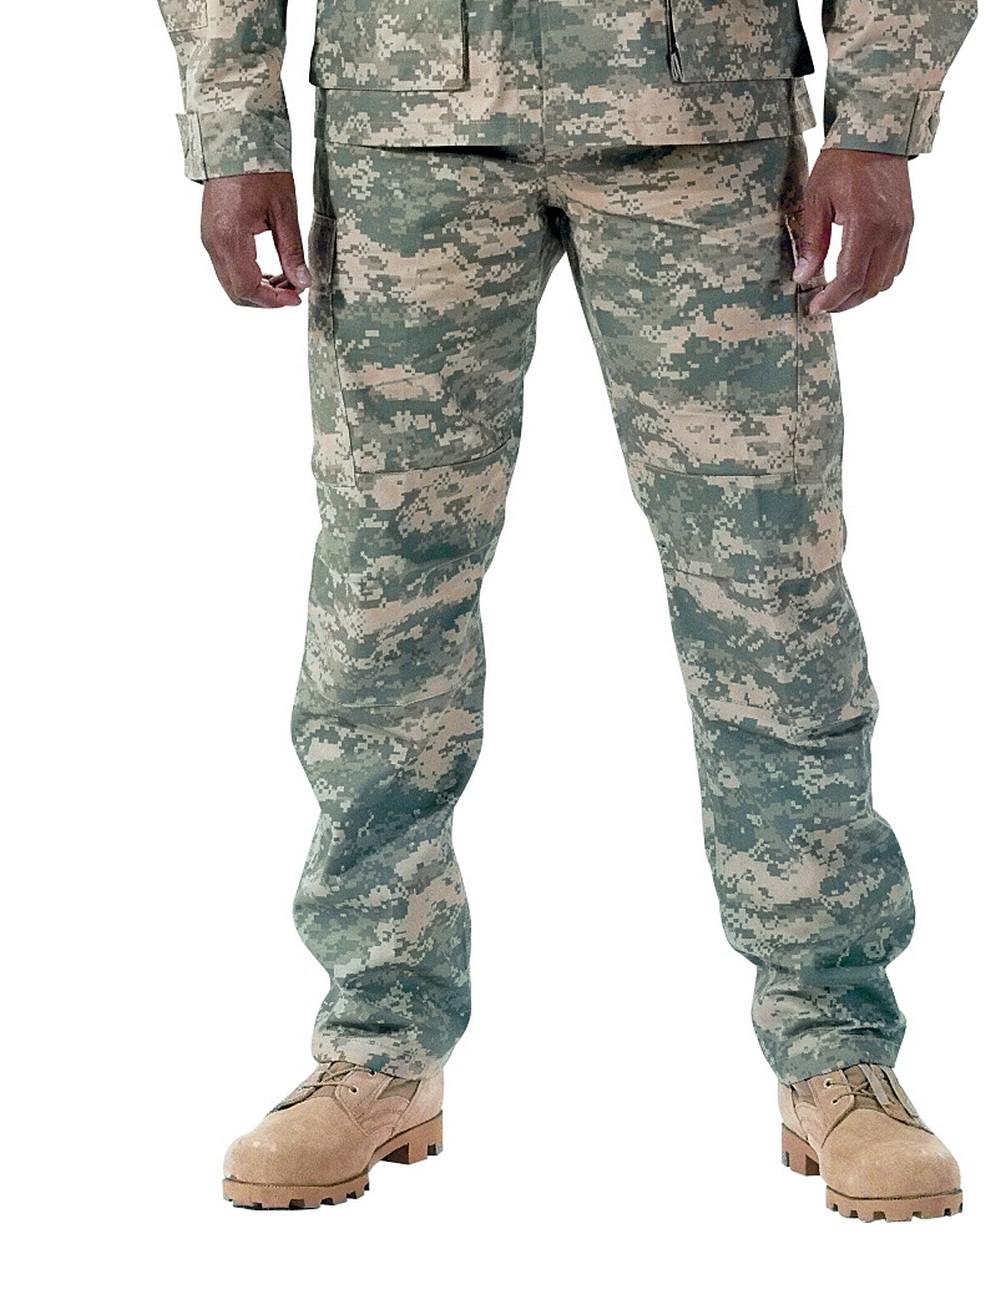 Rothco Mens Pants - Military BDU, ACU Digital Camo, Long Length by Rothco